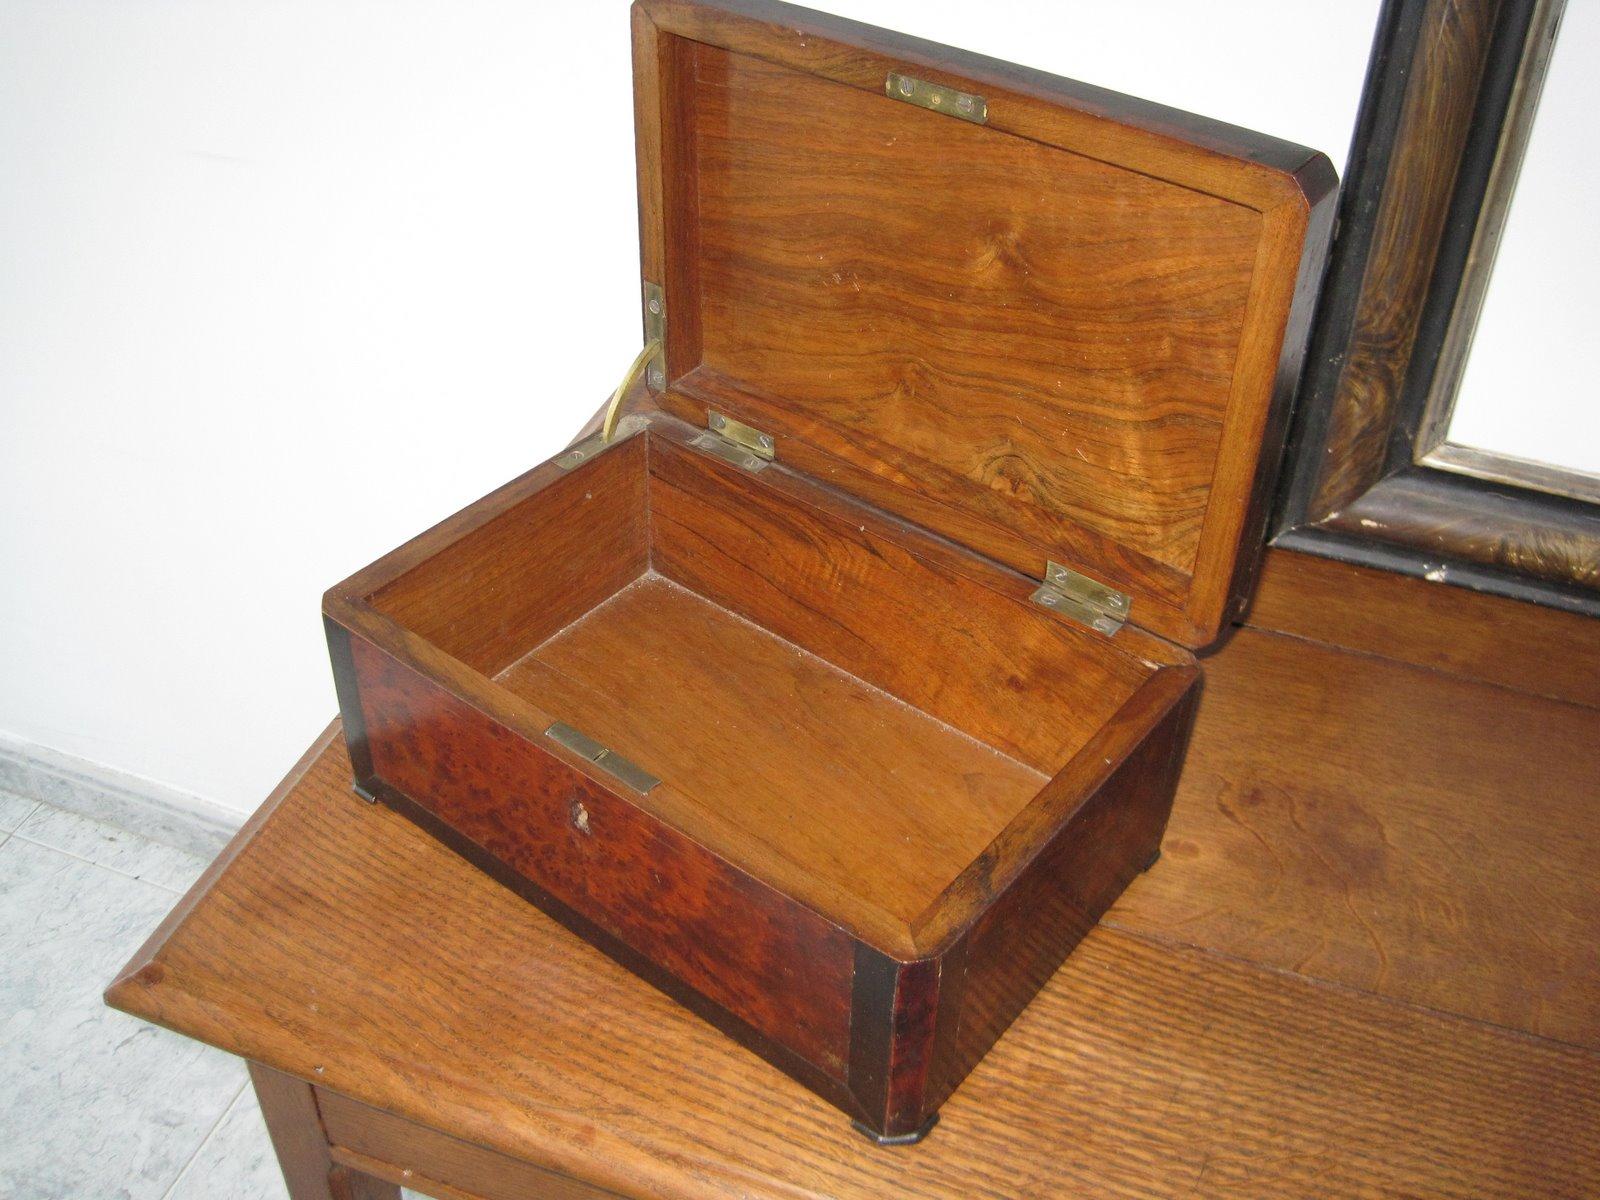 Retazos de mi vida caja antigua for Como restaurar puertas de madera antiguas